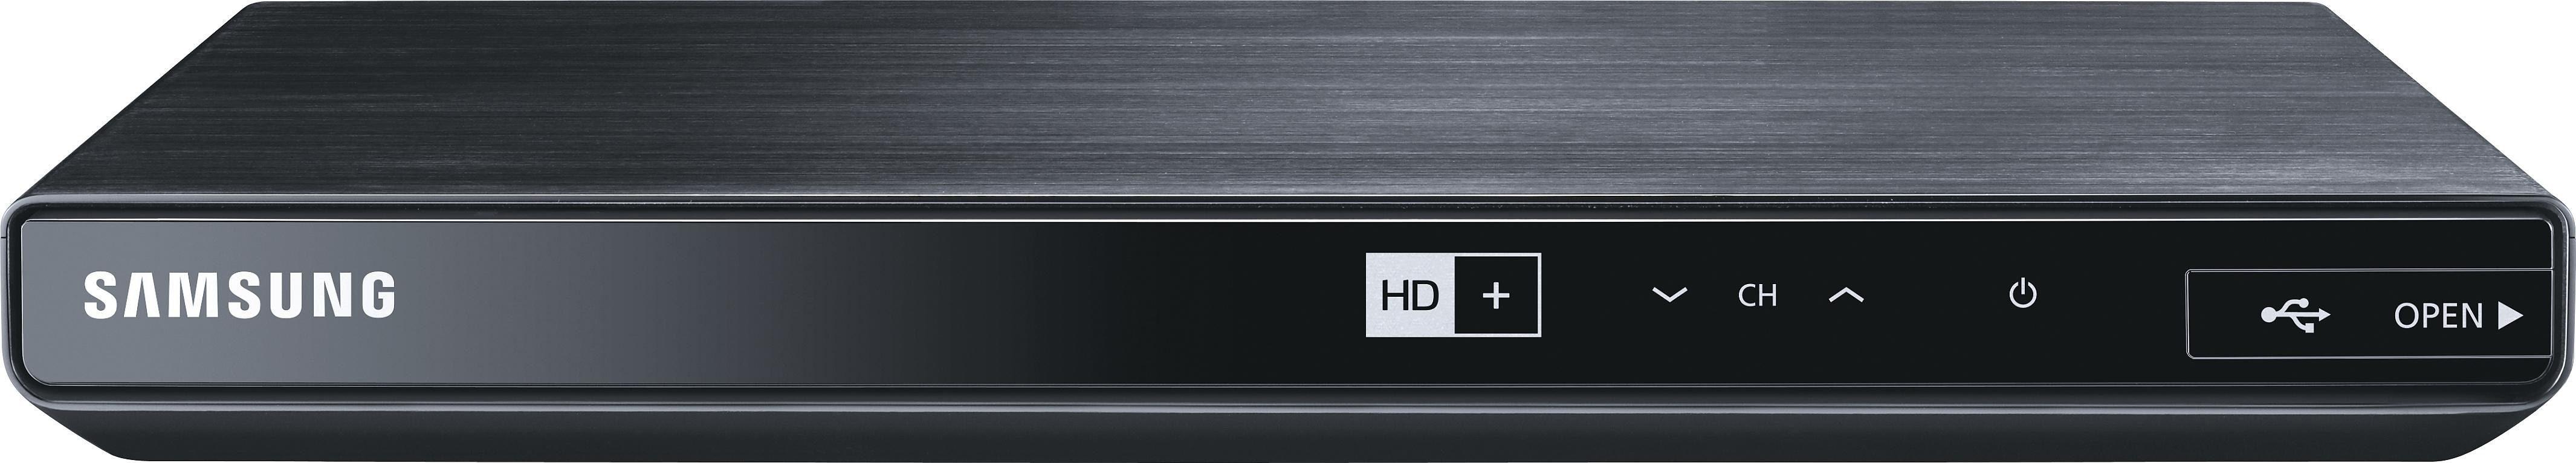 Samsung GX-SM550SH/ZG SAT-Receiver